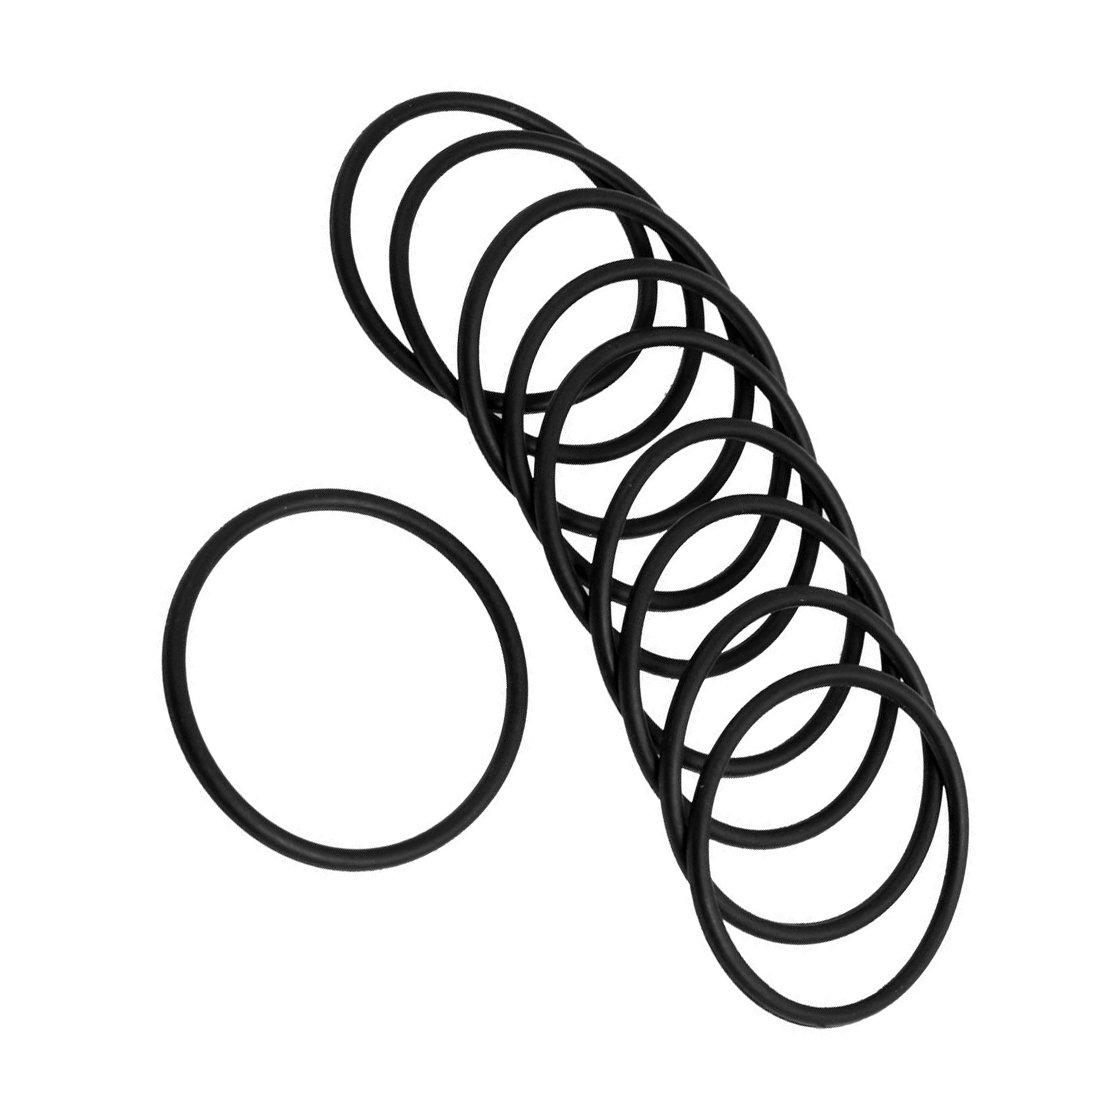 INCREWAY M8 Doppel-Ended Swivel Eye Haken 304 Edelstahl Eye to Eye Swivel Shackle Ring Connector